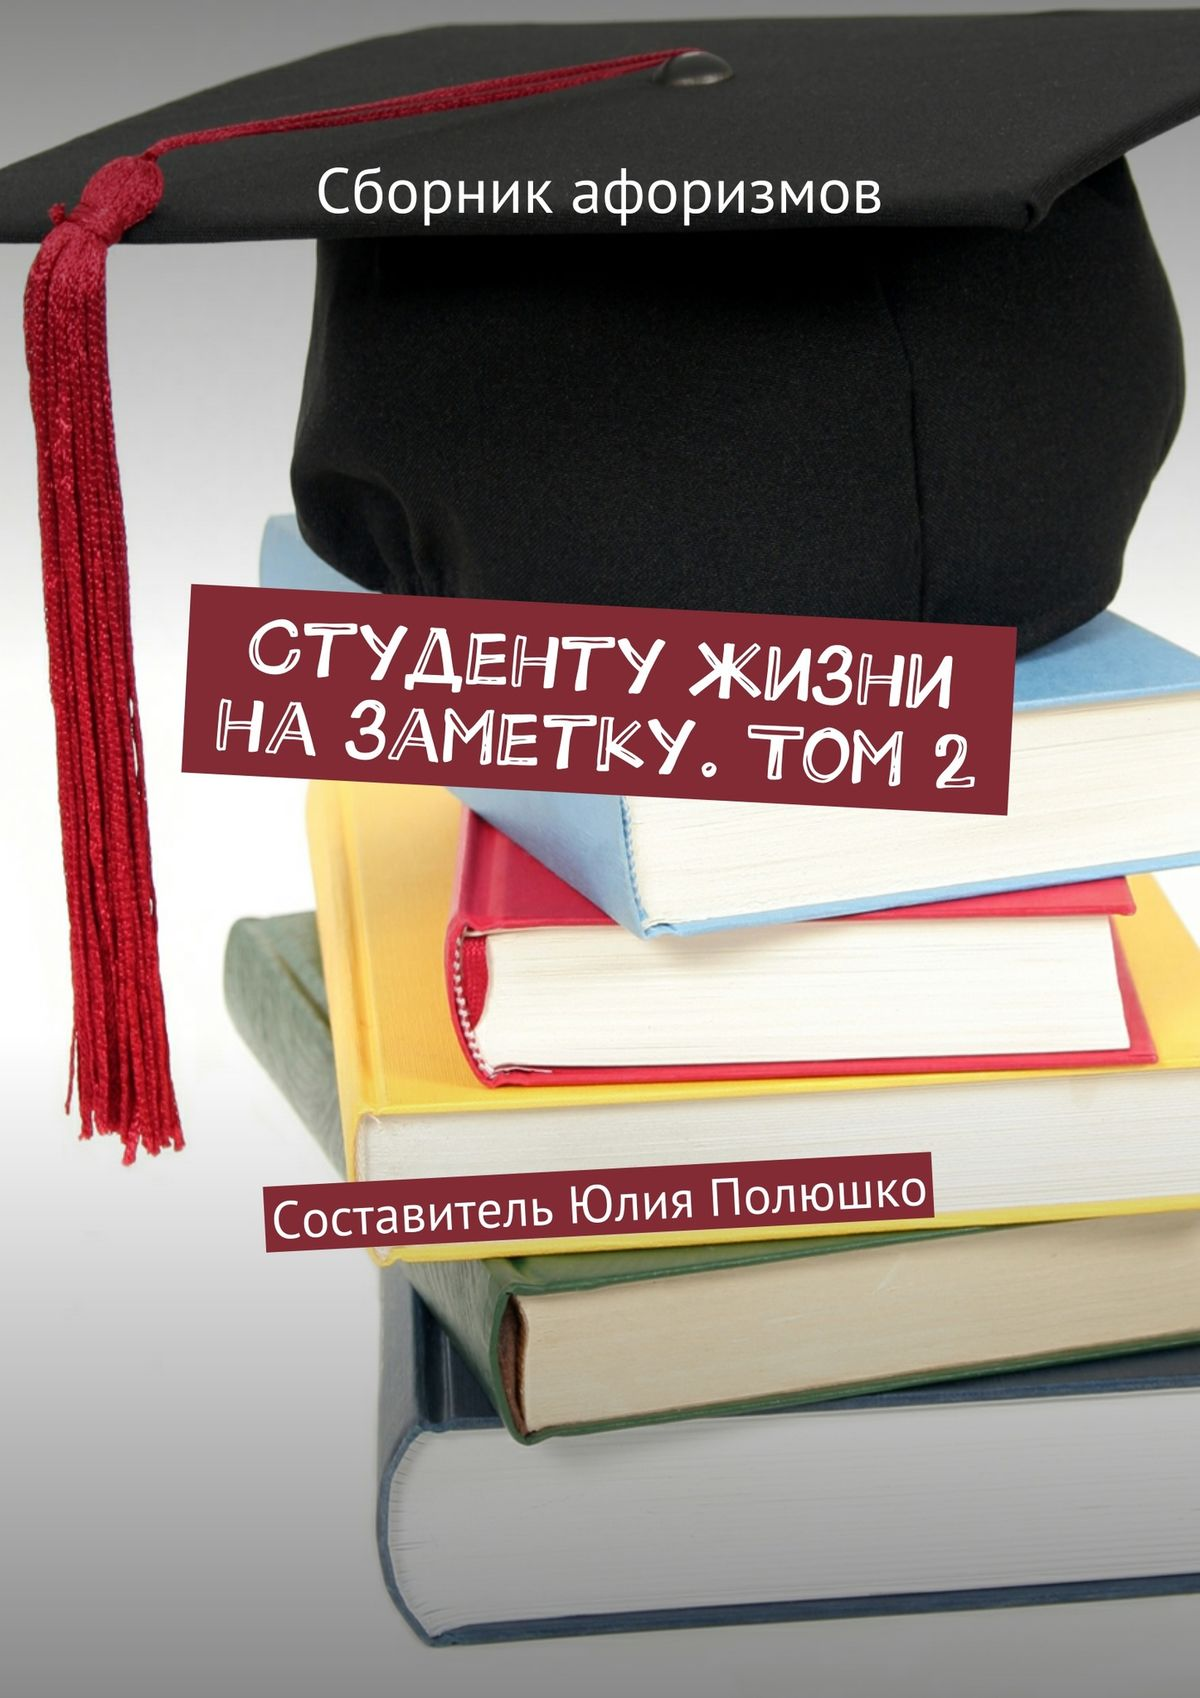 цена на Коллектив авторов Студенту жизни назаметку. Том2